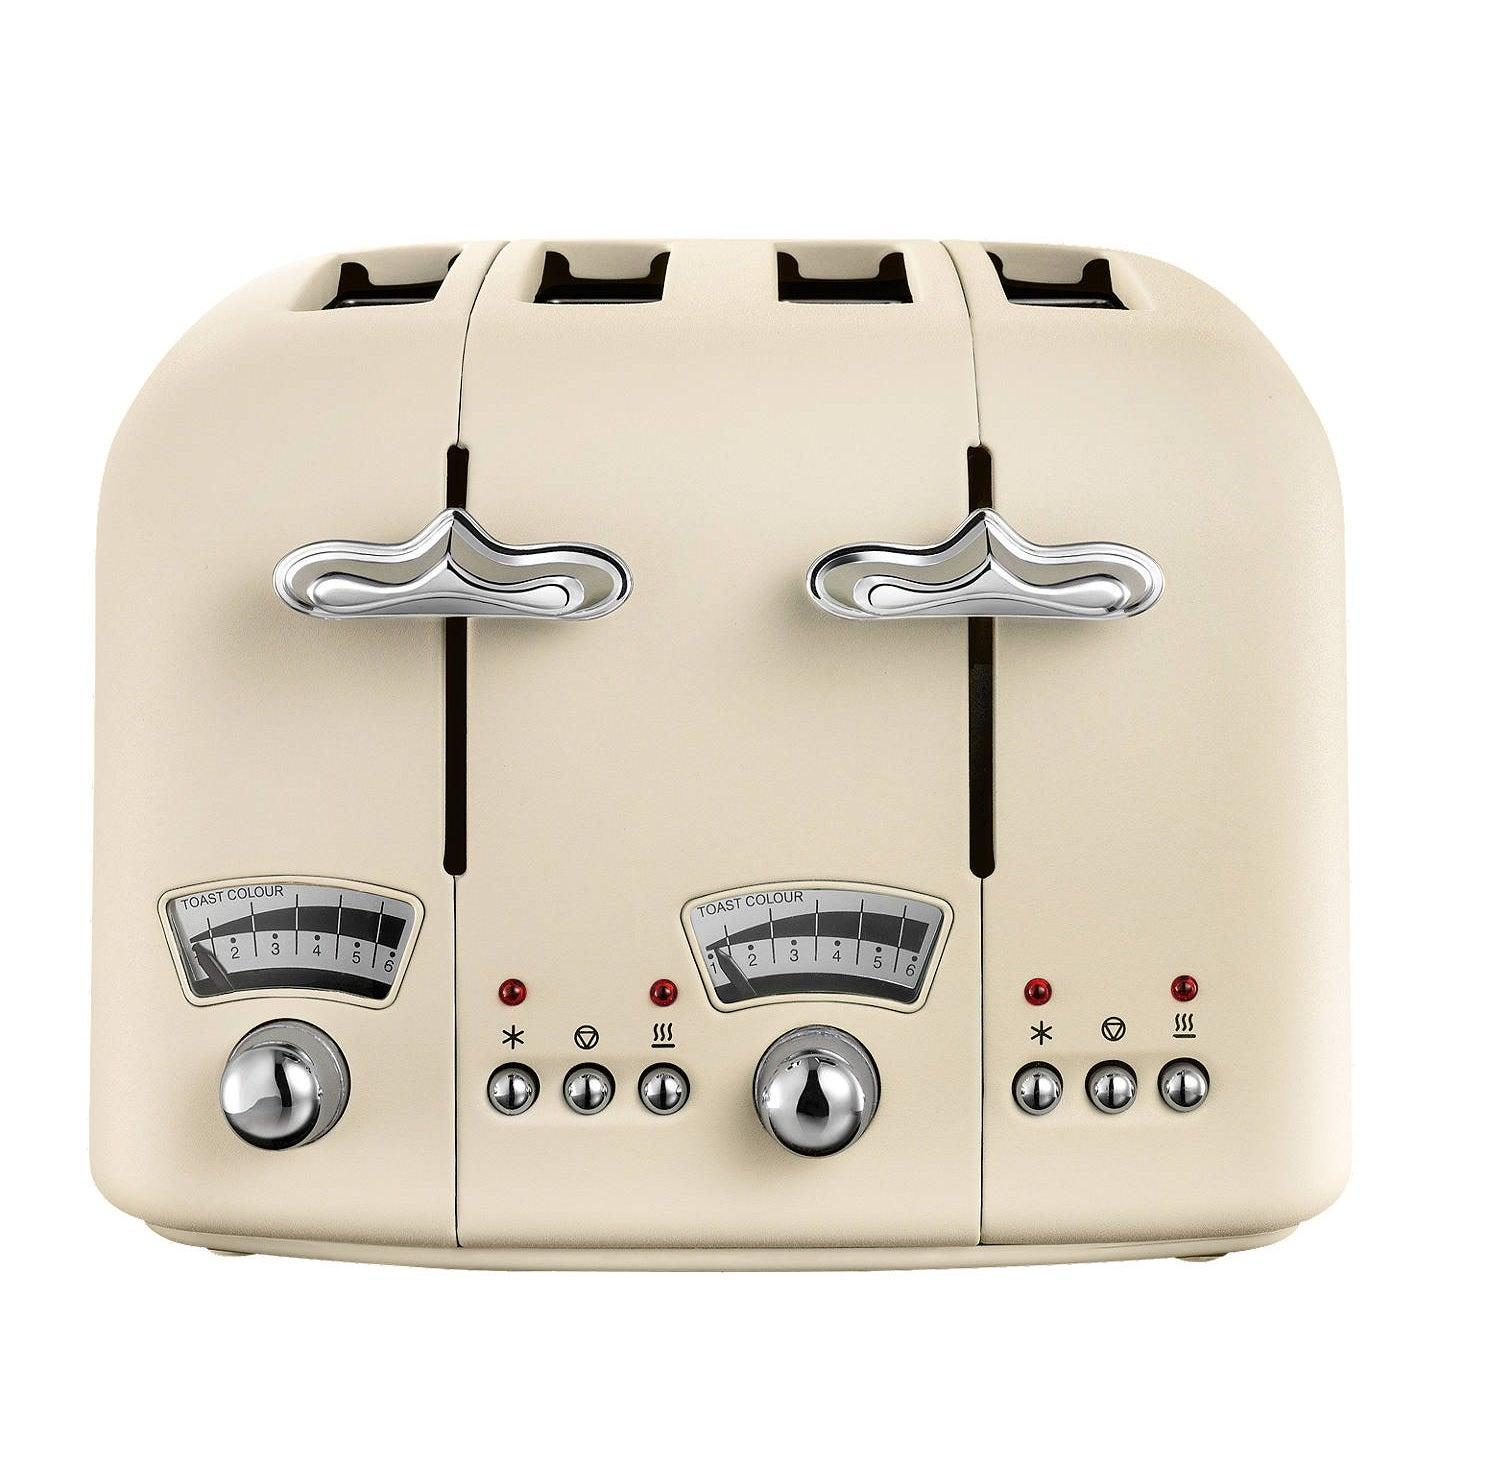 Delonghi Argento Flora 4 Toaster